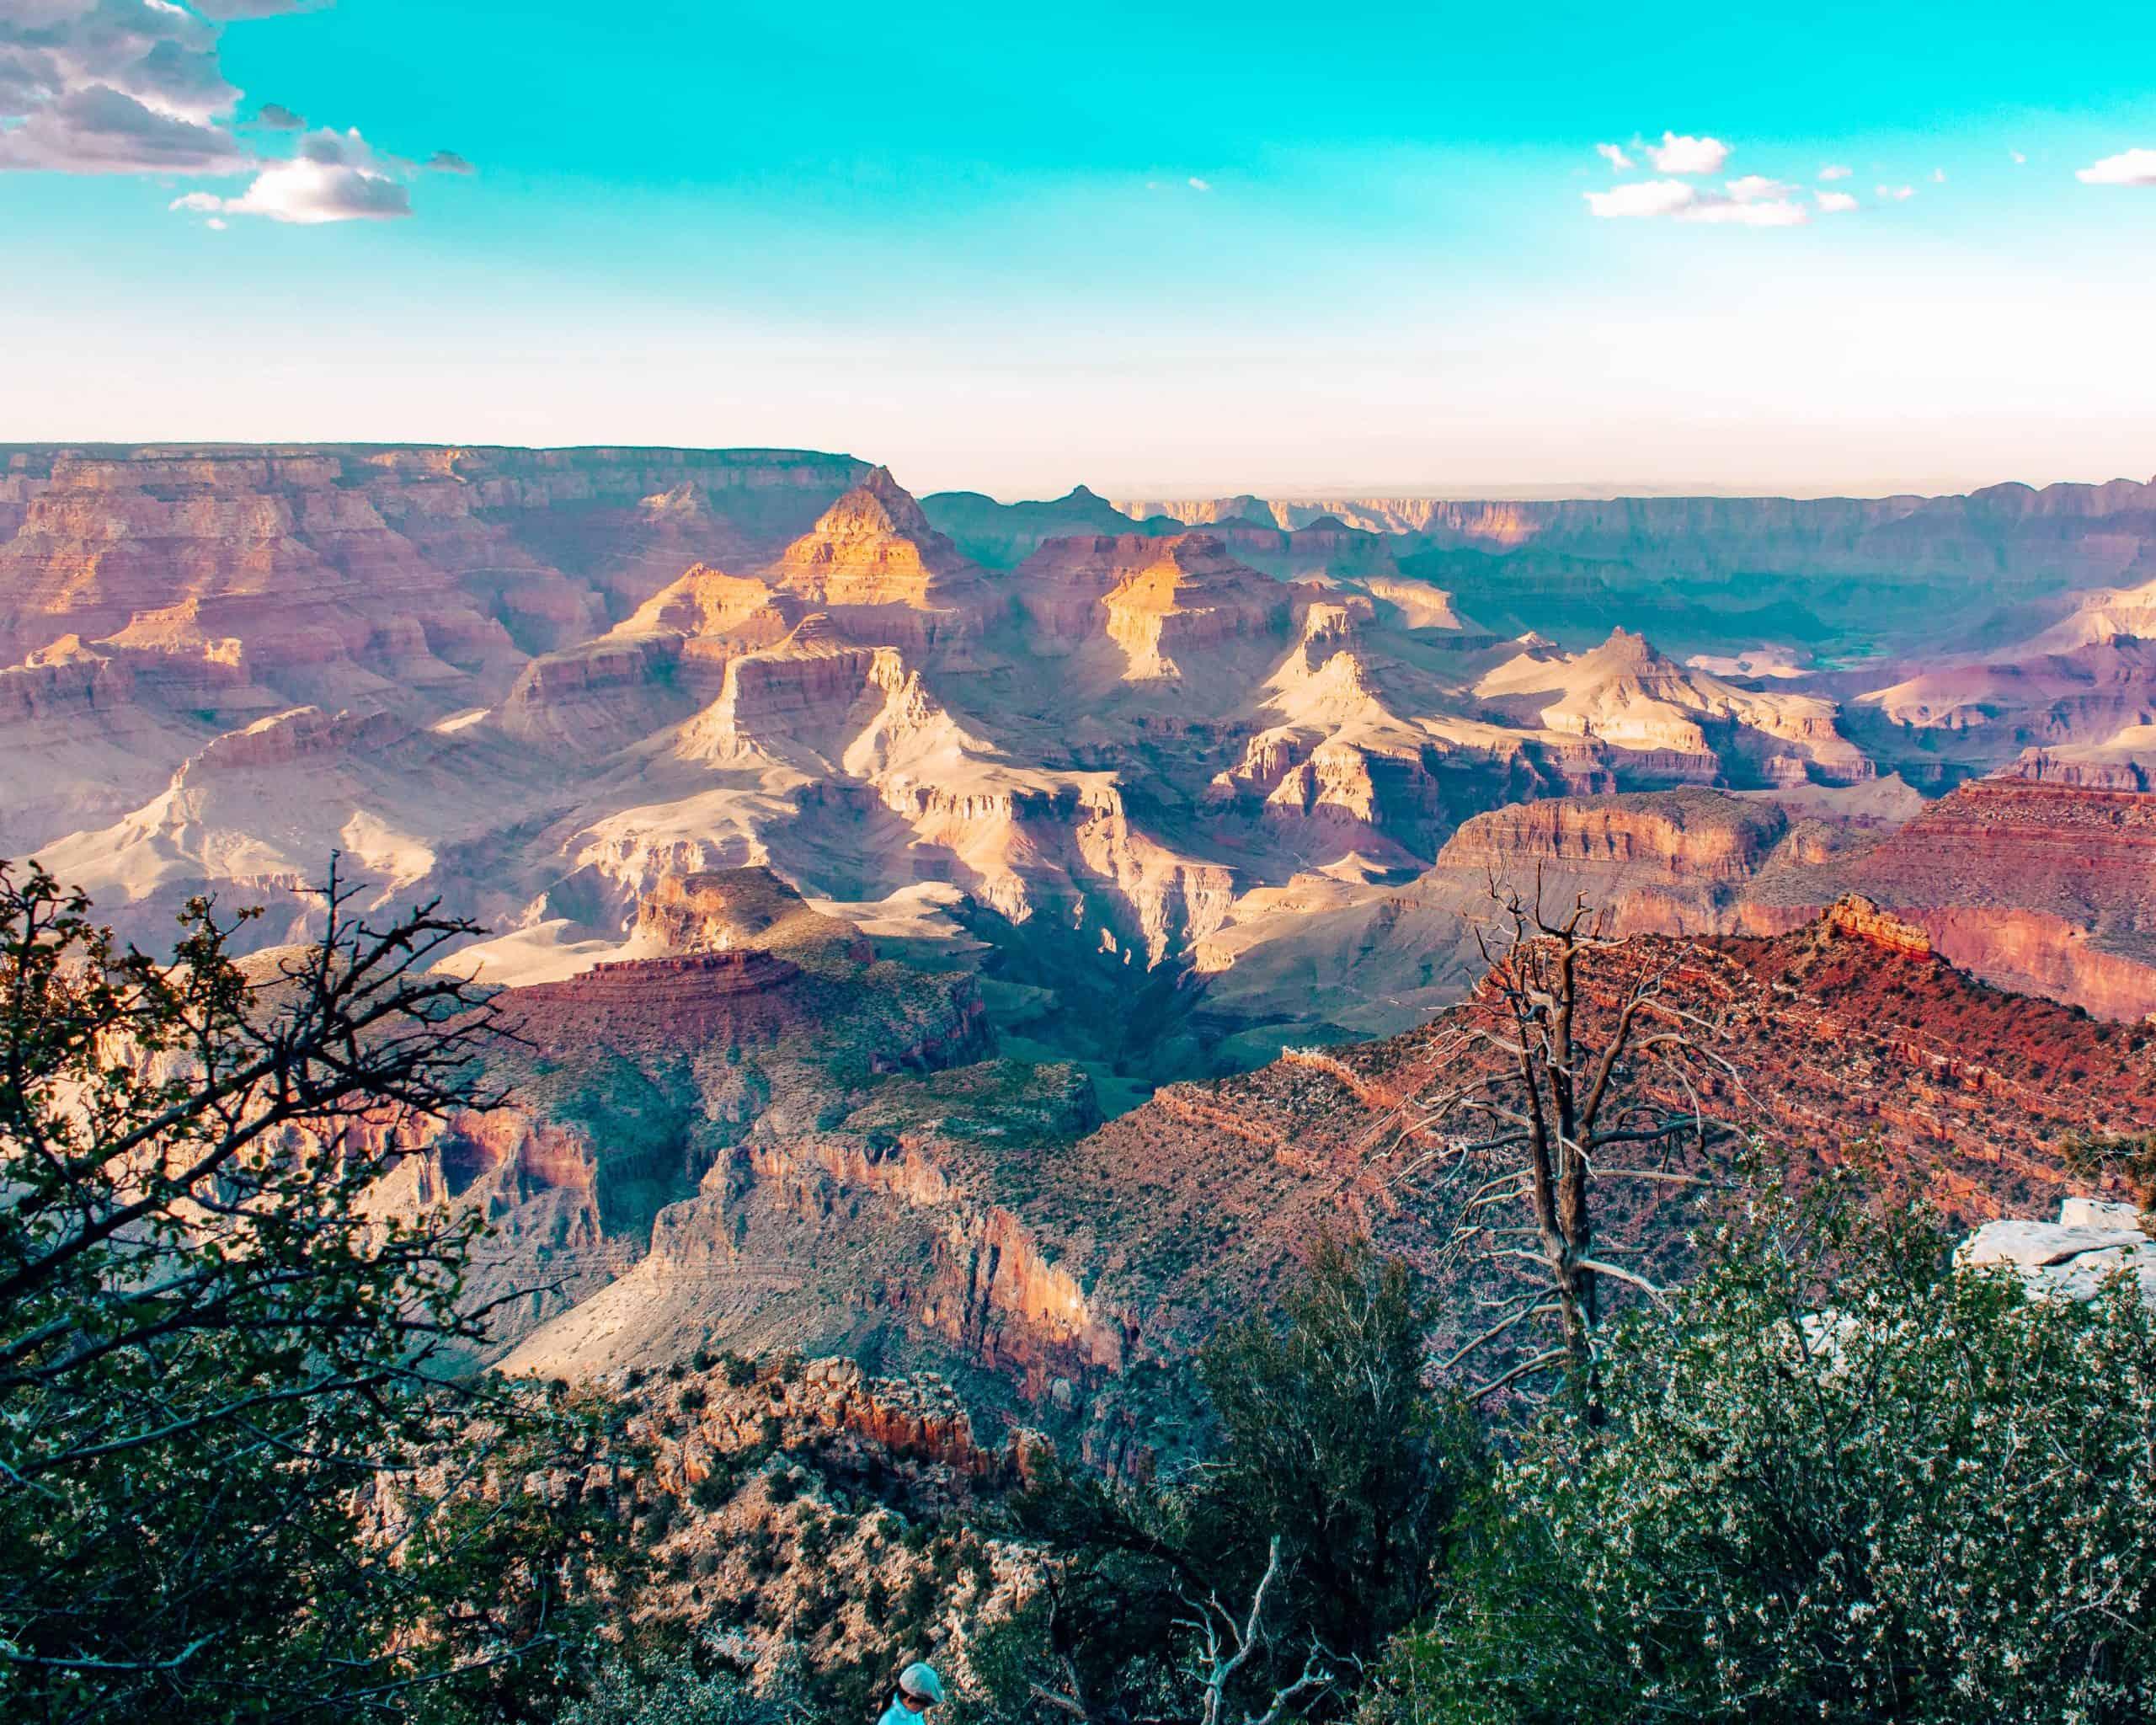 Sunset at Grand Canyon South Rim Arizona